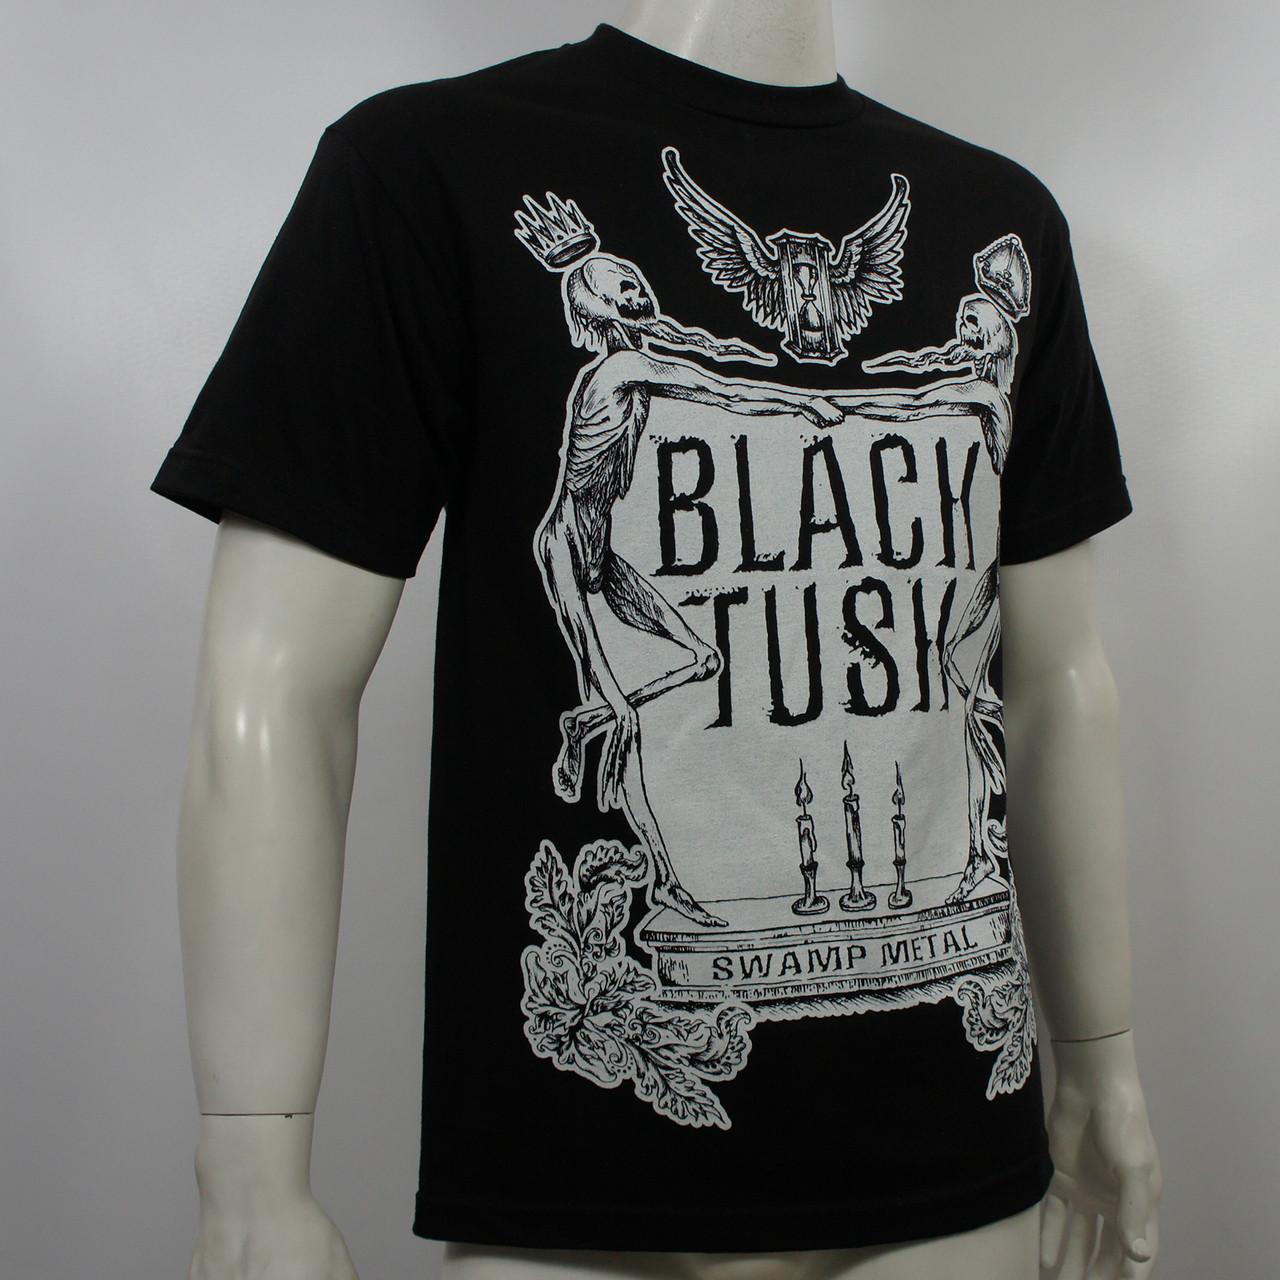 http://d3d71ba2asa5oz.cloudfront.net/12013655/images/30419-black-tusk-altar-t-shirt-black-(4).jpg